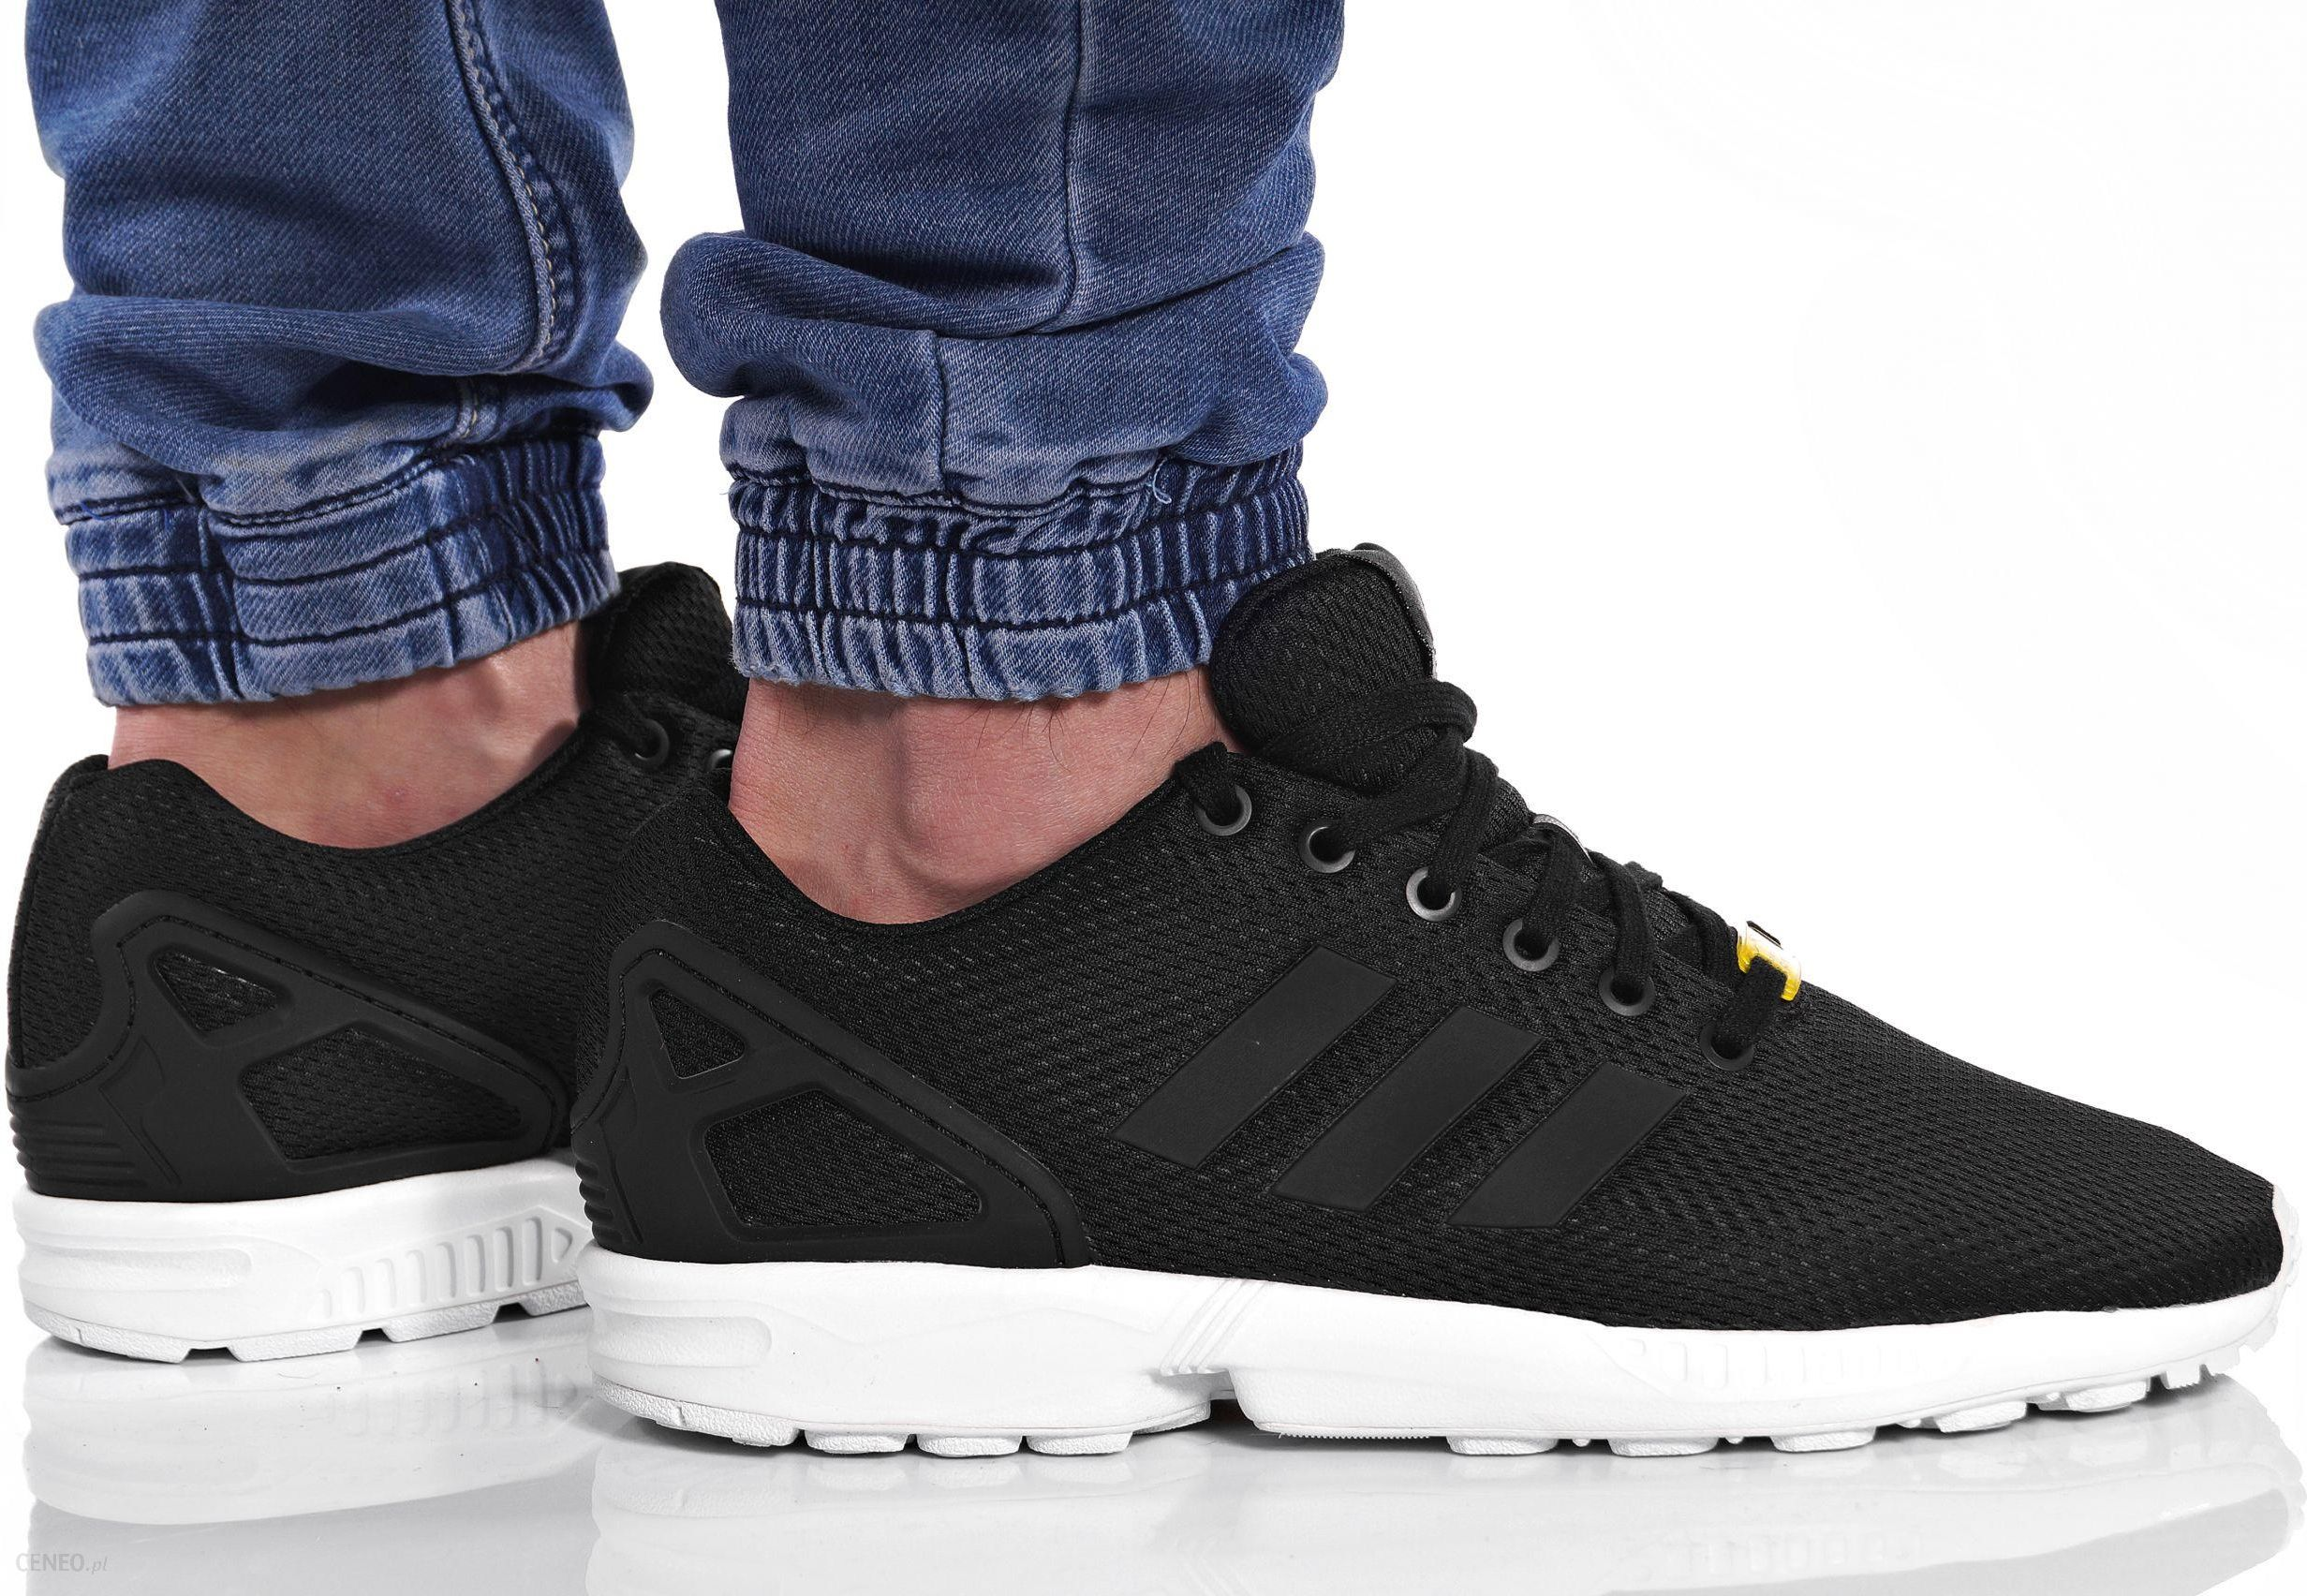 online store 86df3 ef226 reduced adidas zx flux base pack core black m19840 m19840 sklep worldbox.pl  2fb76 f3b78  50% off obuwie adidas zx flux m19840 zdjcie 1 80403 065f8